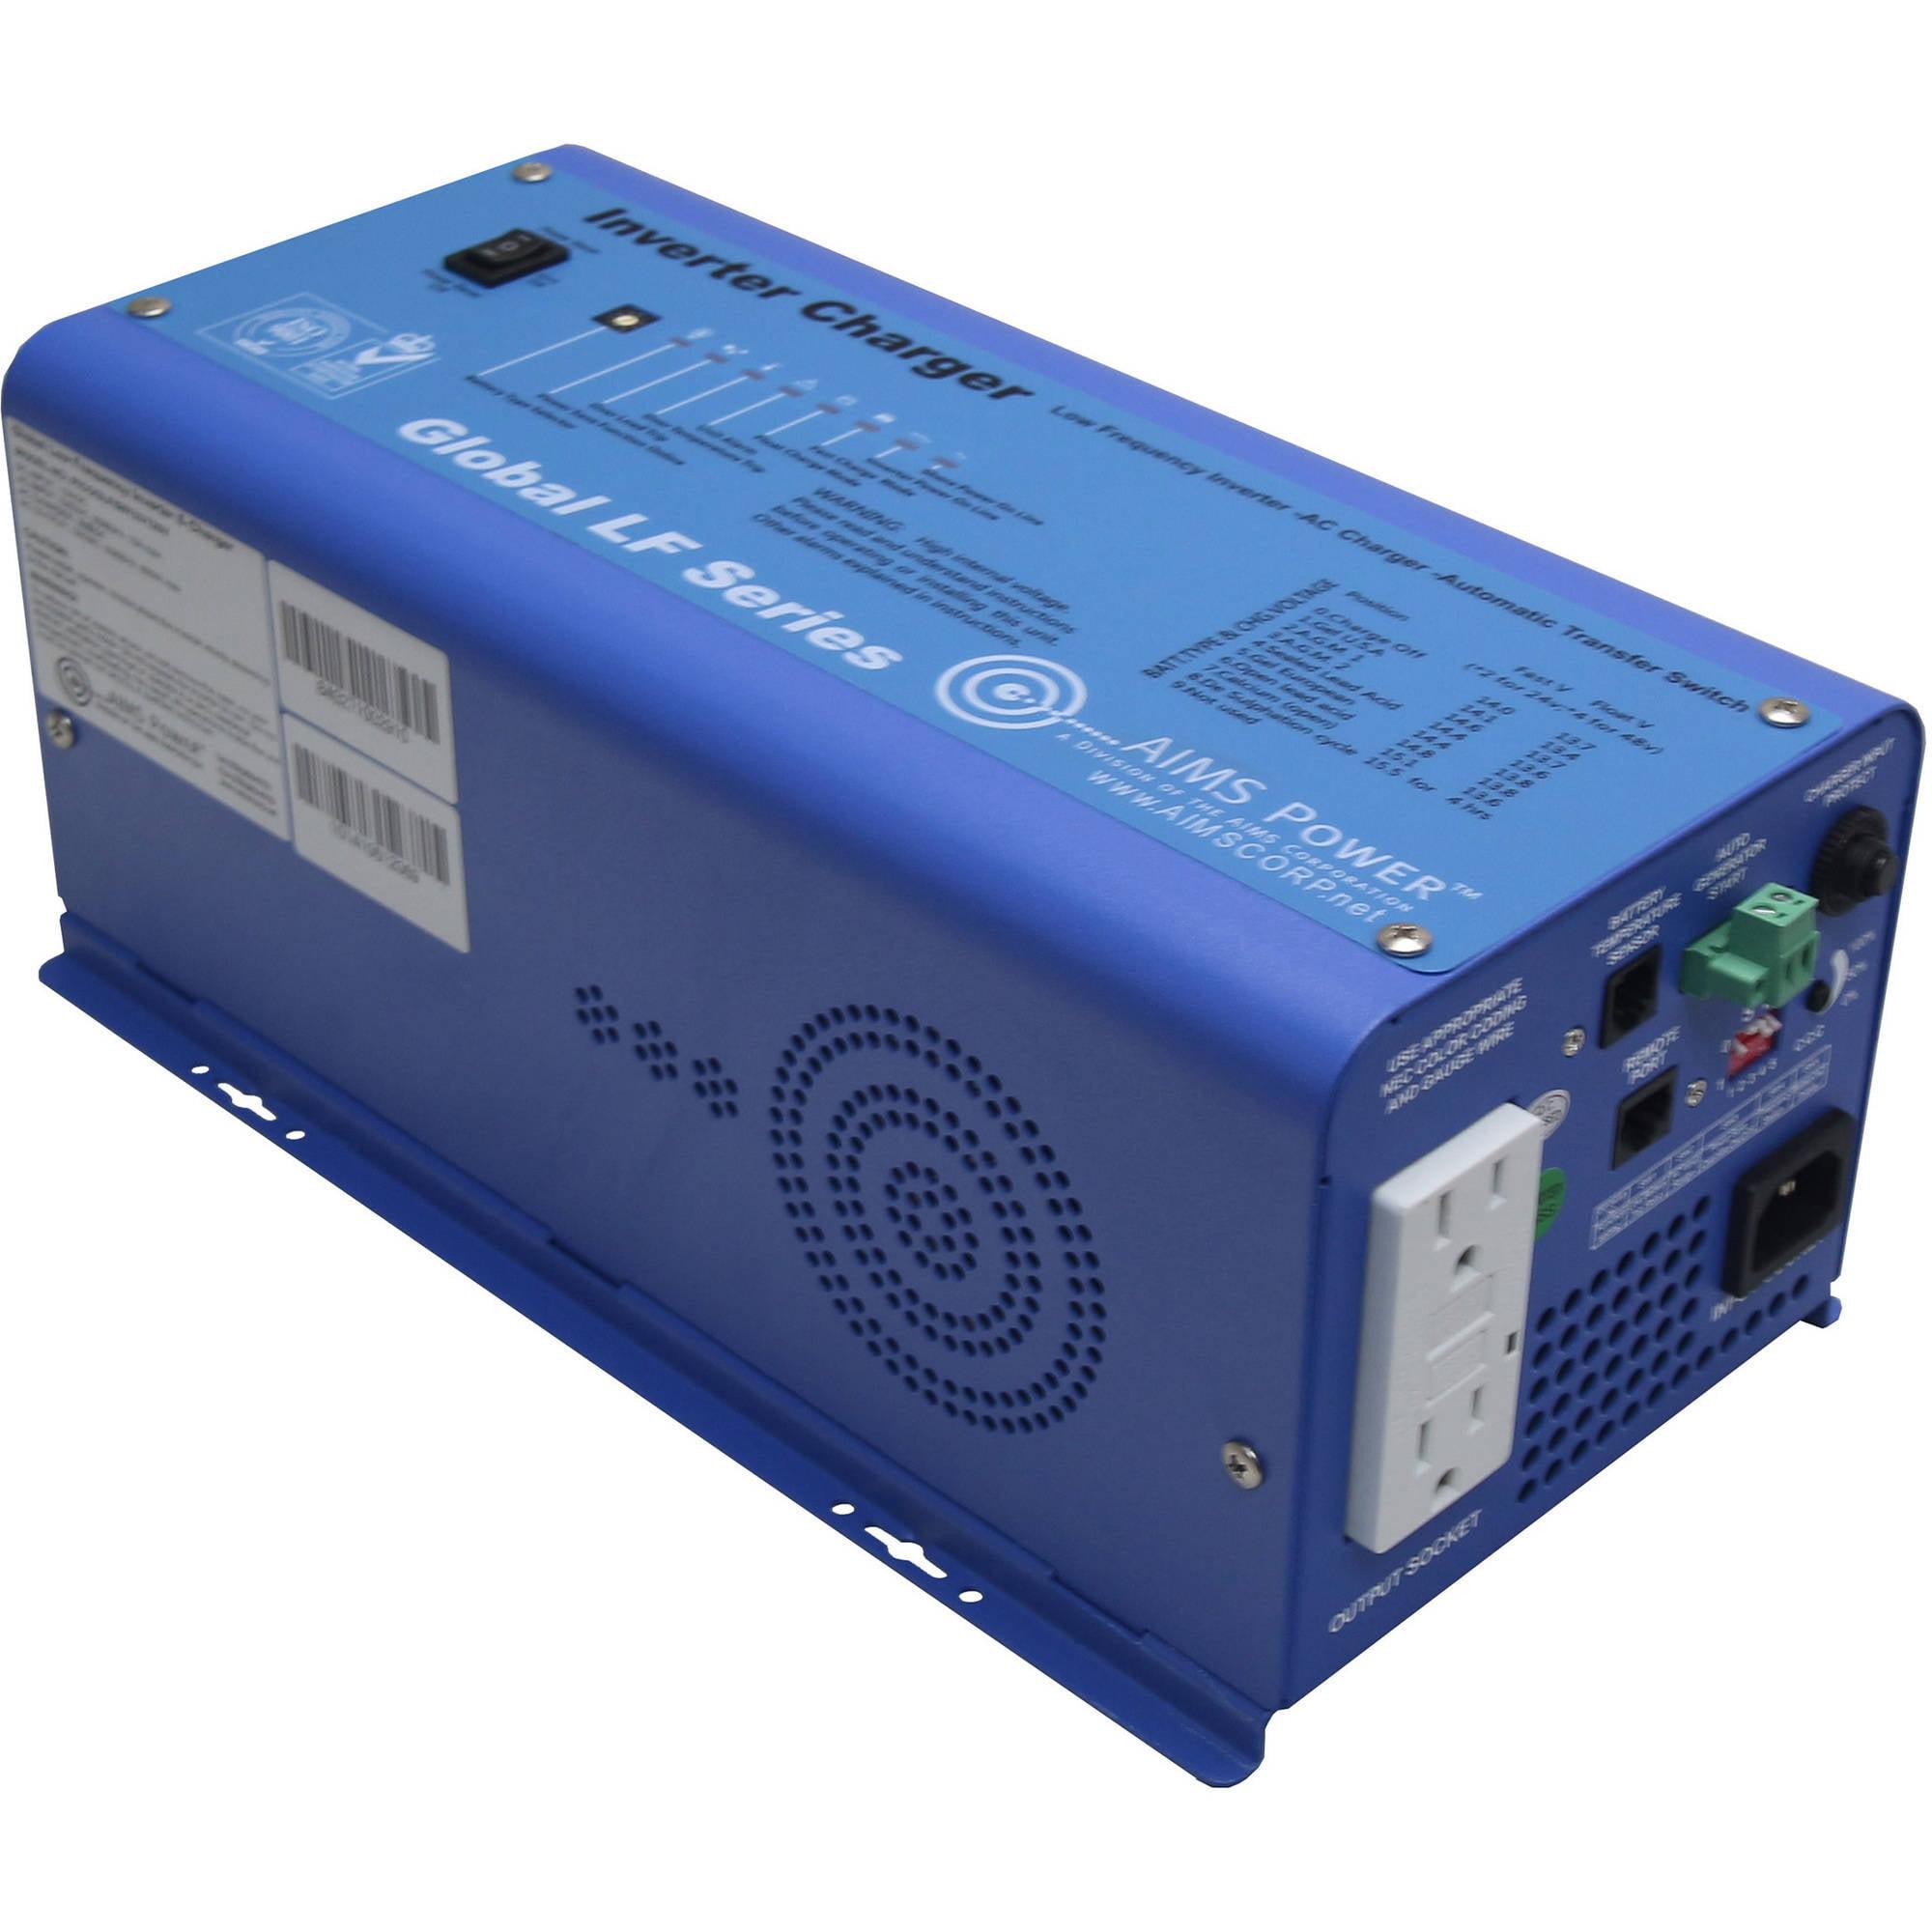 8f35532b ec90 4522 bedb c150491854e8_1.5c5ea981718c271500215cc4e4c5a72e aims power 1500 watt 12v pure sine inverter walmart com  at reclaimingppi.co